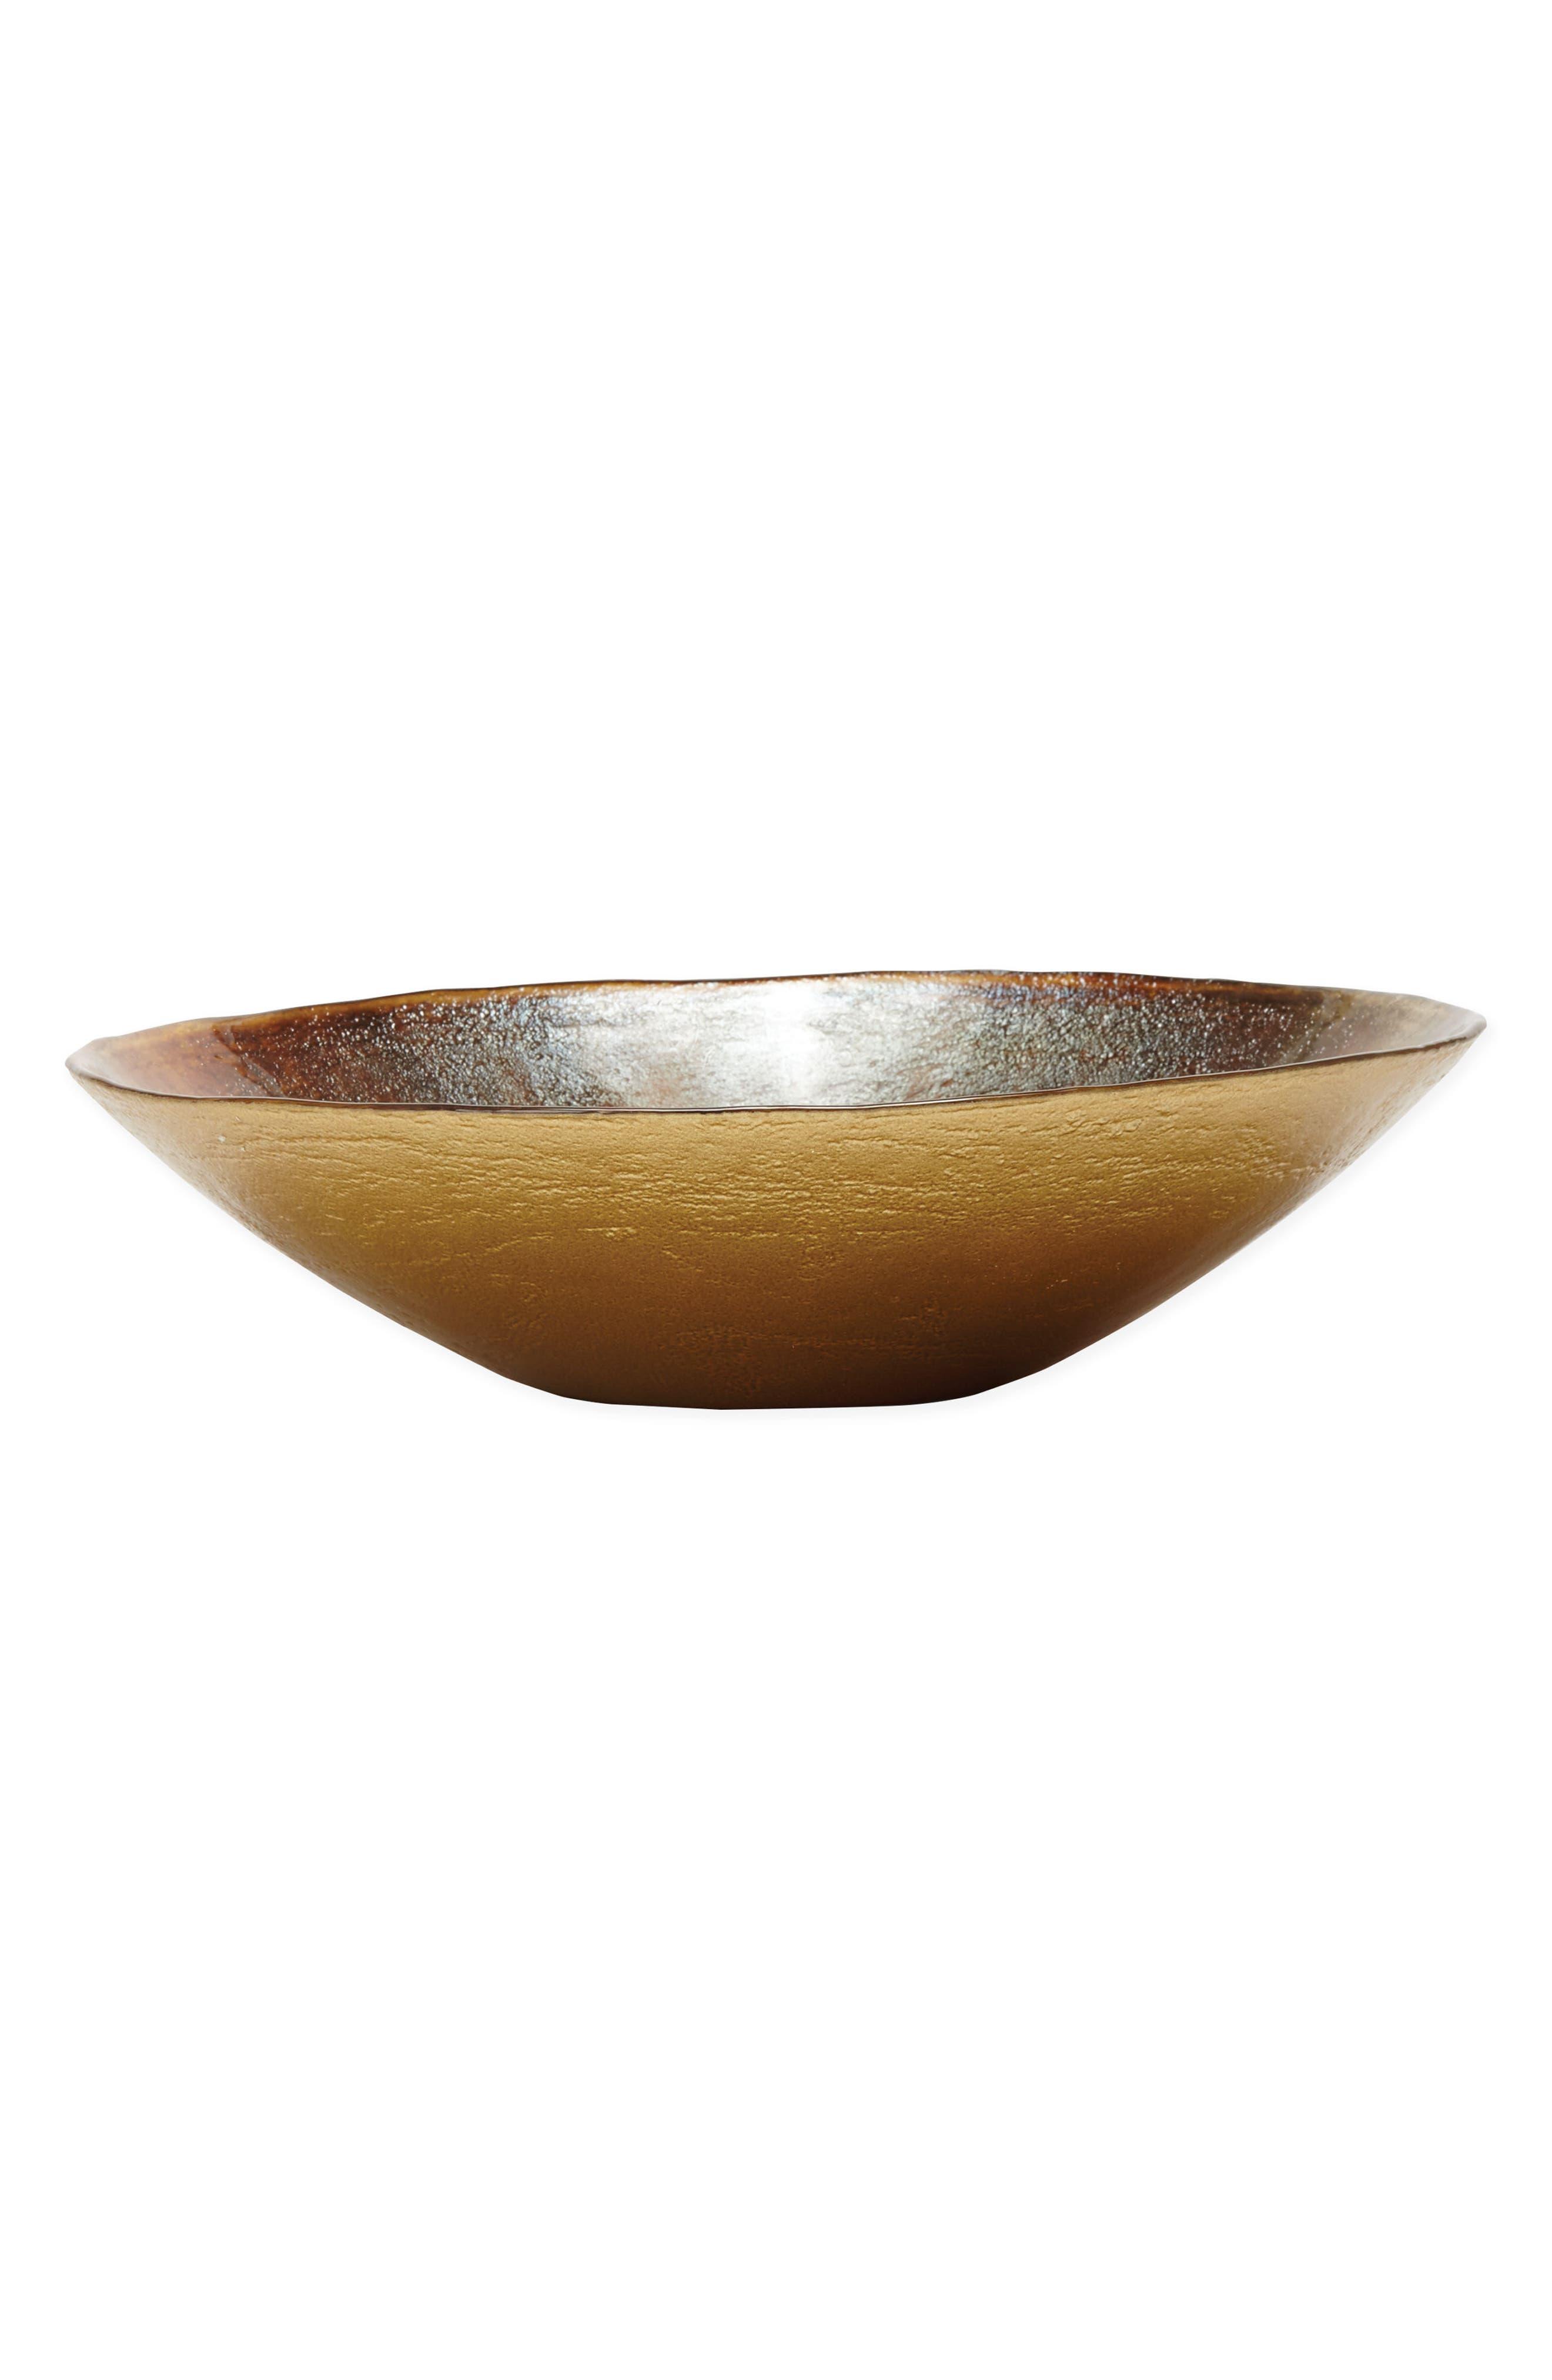 Earth Glass Bowl,                             Alternate thumbnail 2, color,                             Brown/ Gold - Medium